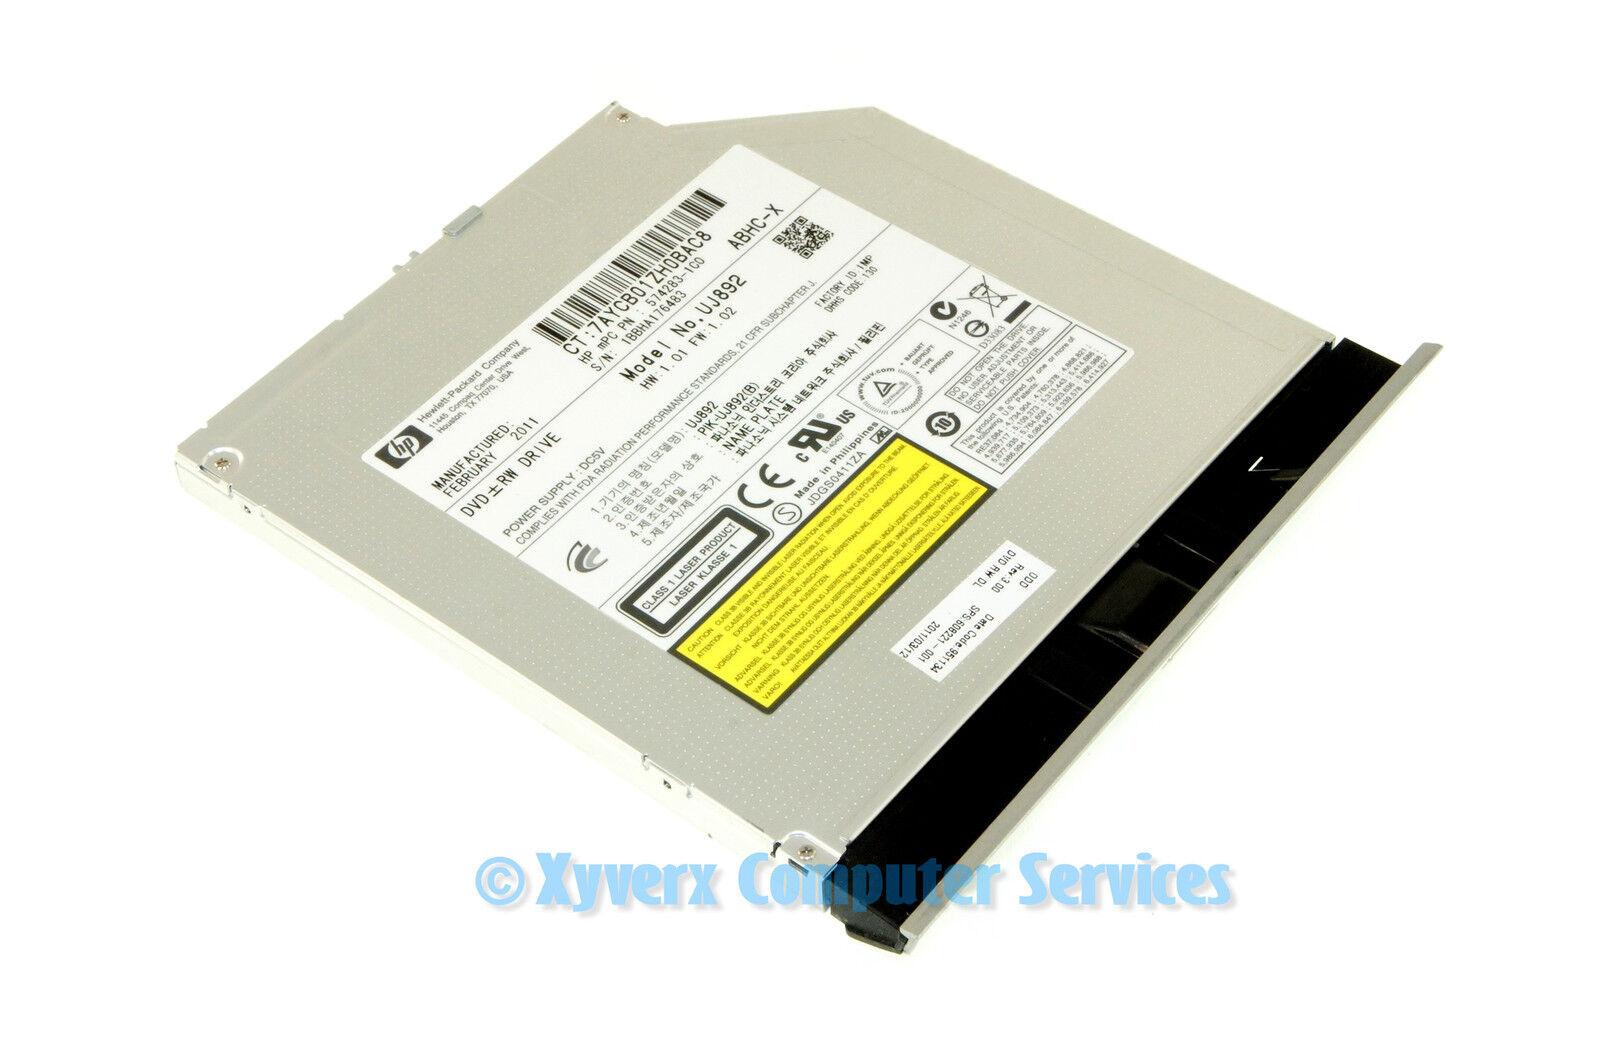 ATAPI DVD A DH20A4P ATA Device Drivers Download